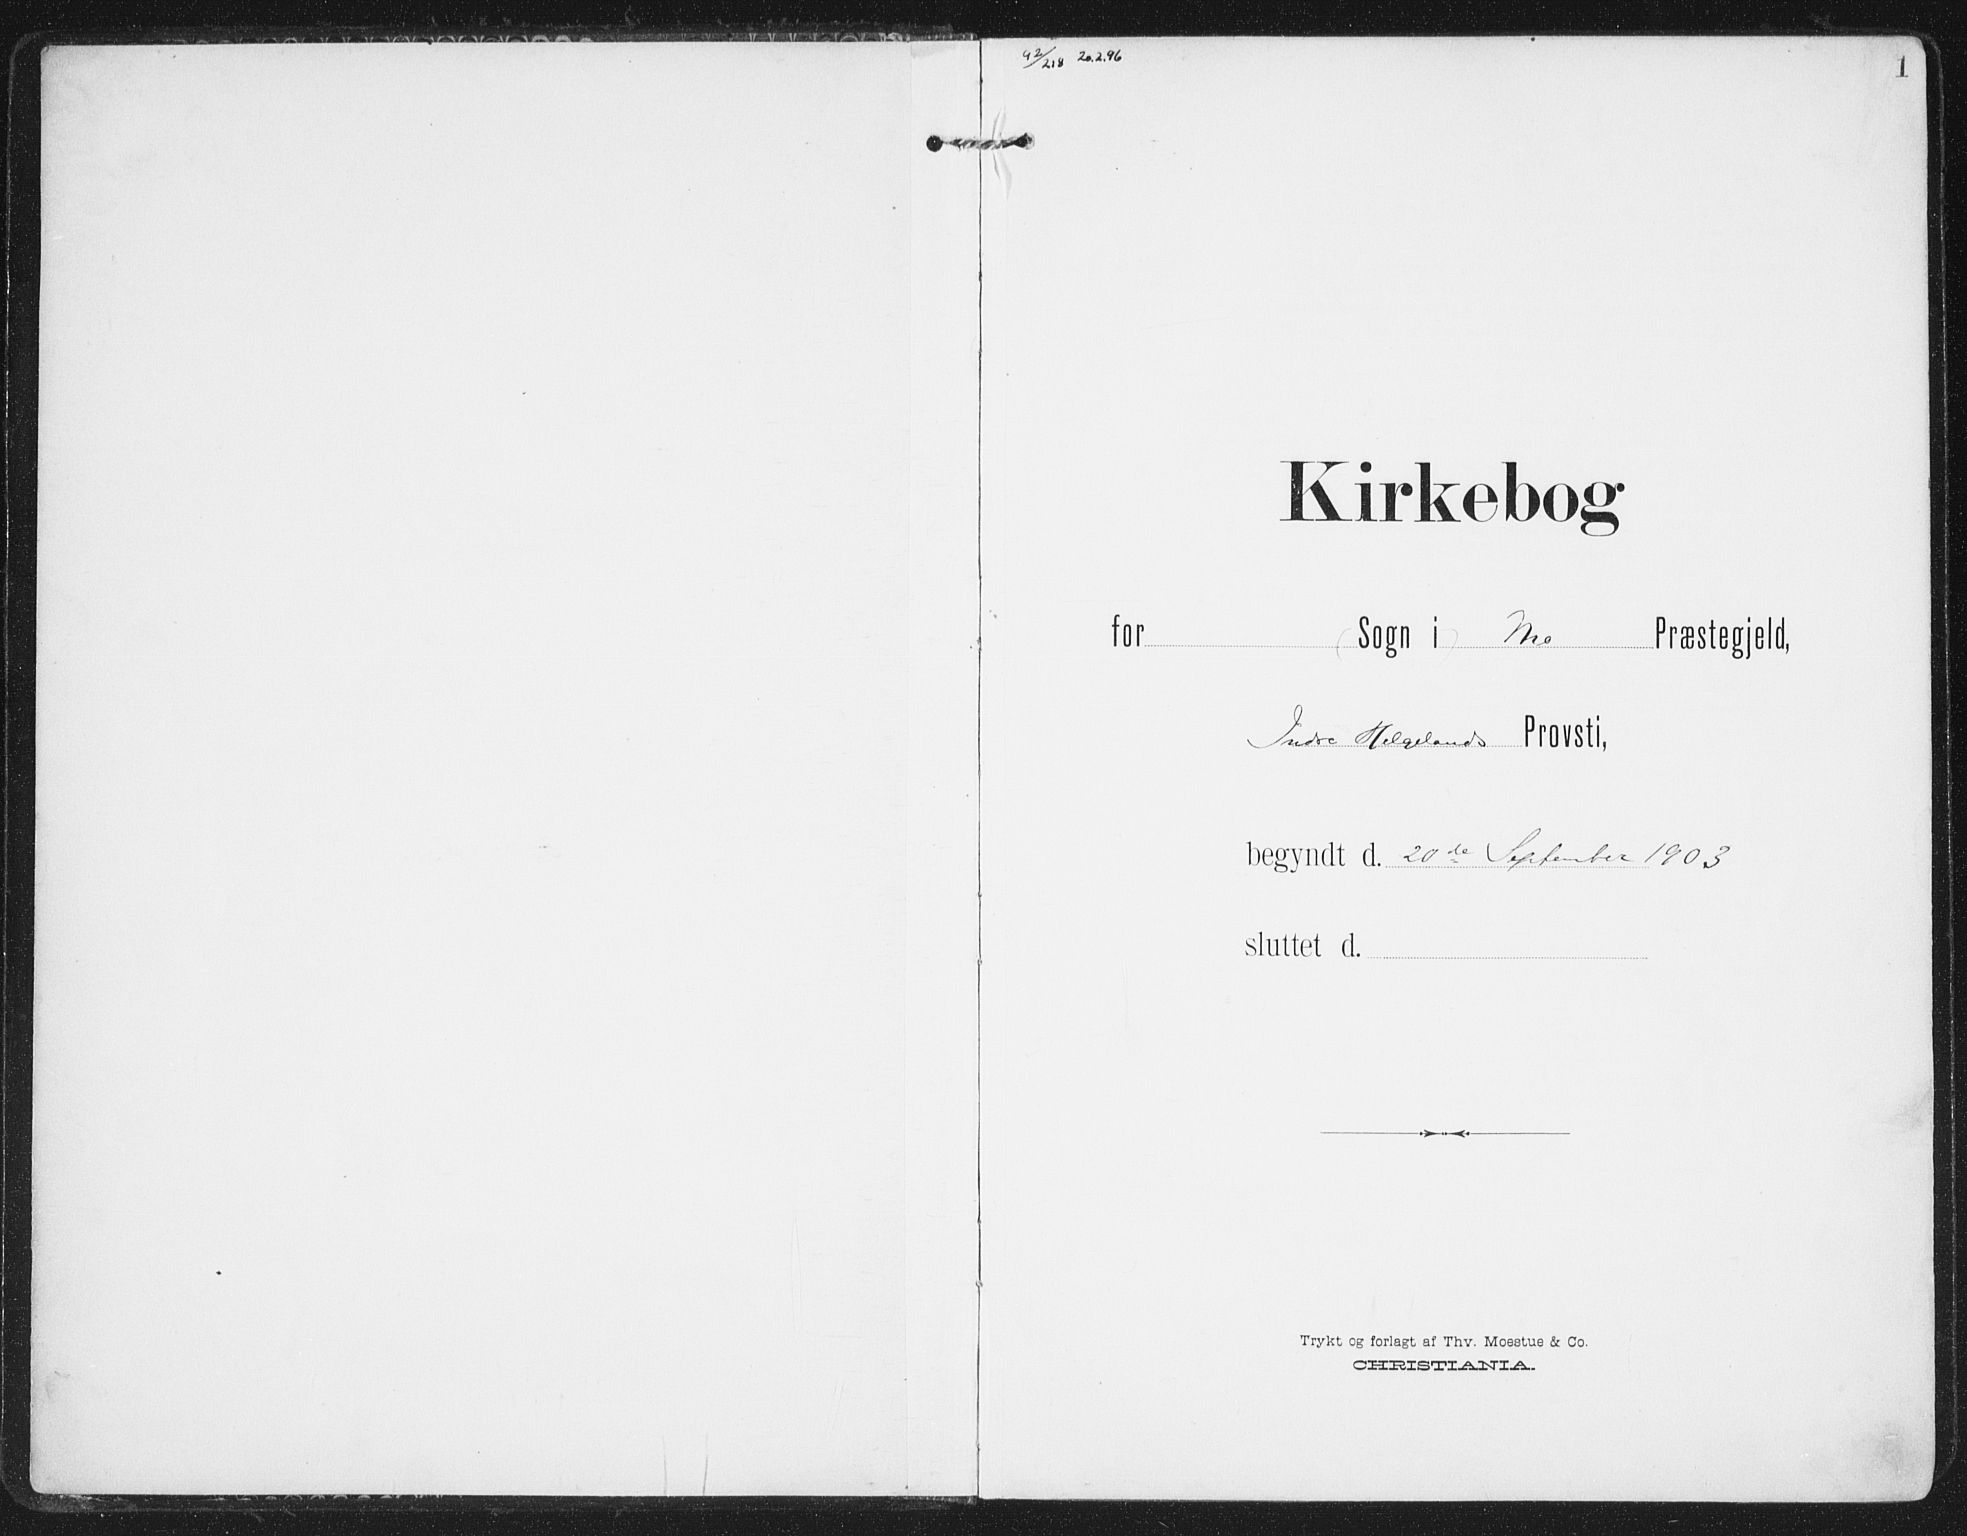 SAT, Ministerialprotokoller, klokkerbøker og fødselsregistre - Nordland, 827/L0402: Ministerialbok nr. 827A14, 1903-1912, s. 1